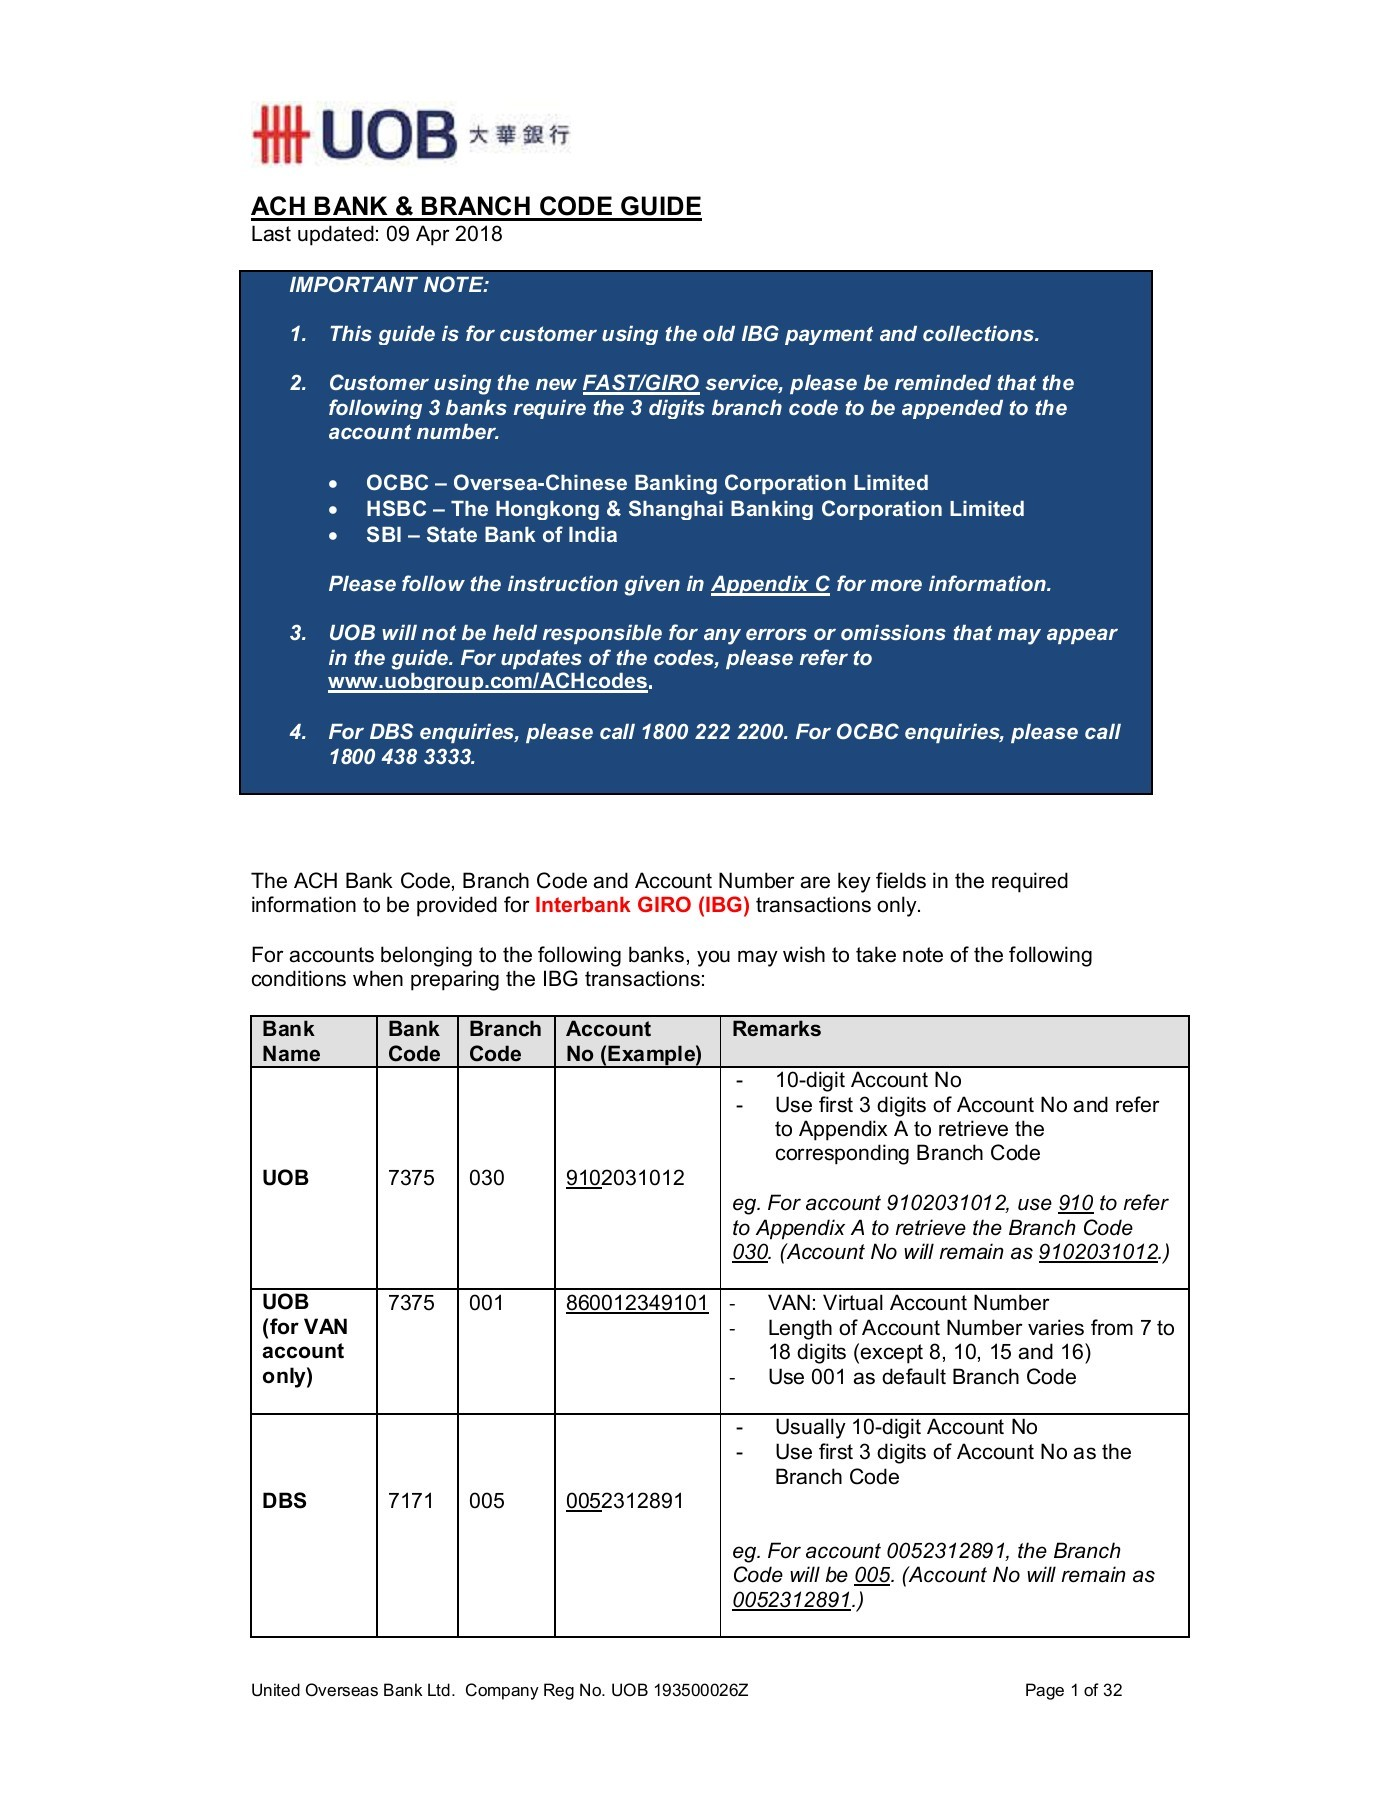 Dbs Hk Bank Code 032 : Branch